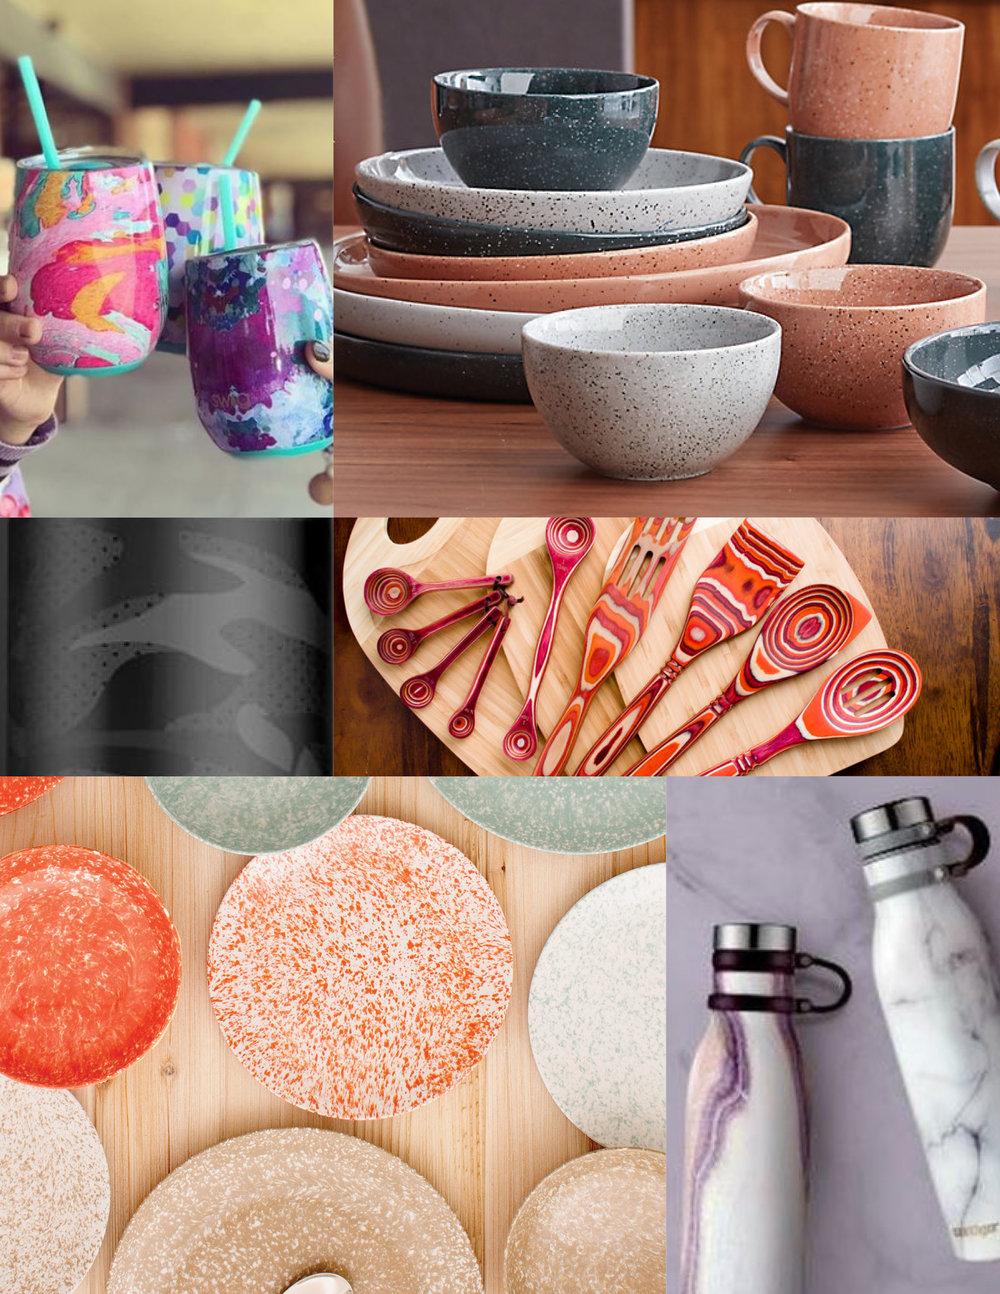 HousewaresShow_2019_Trends_F.jpg